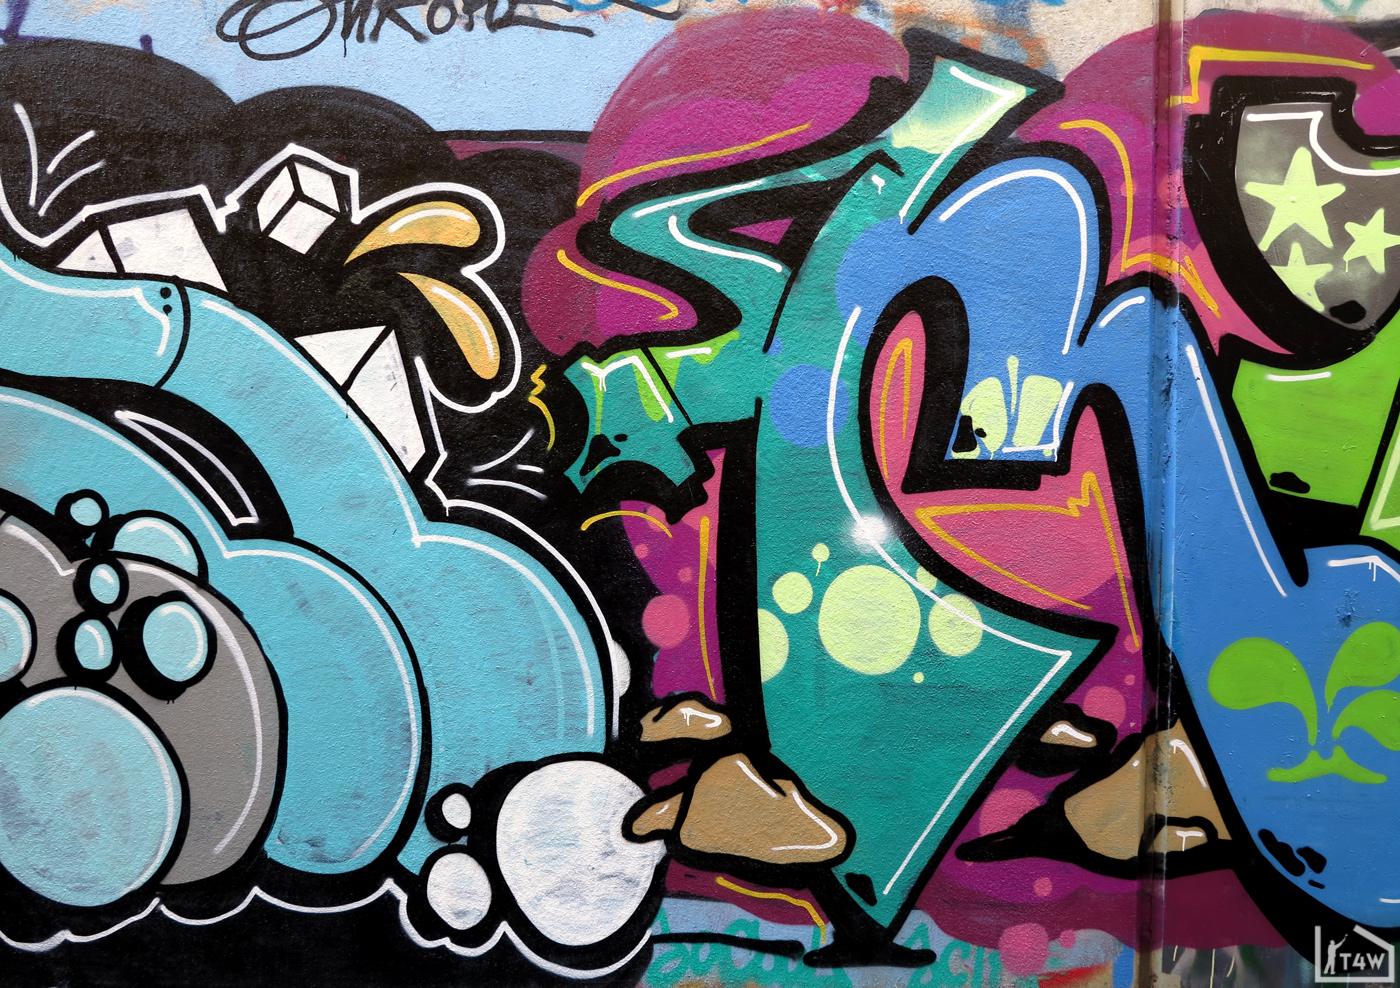 the-fourth-walls-melbourne-graffiti-noface-mr.-tee-abbotsford6